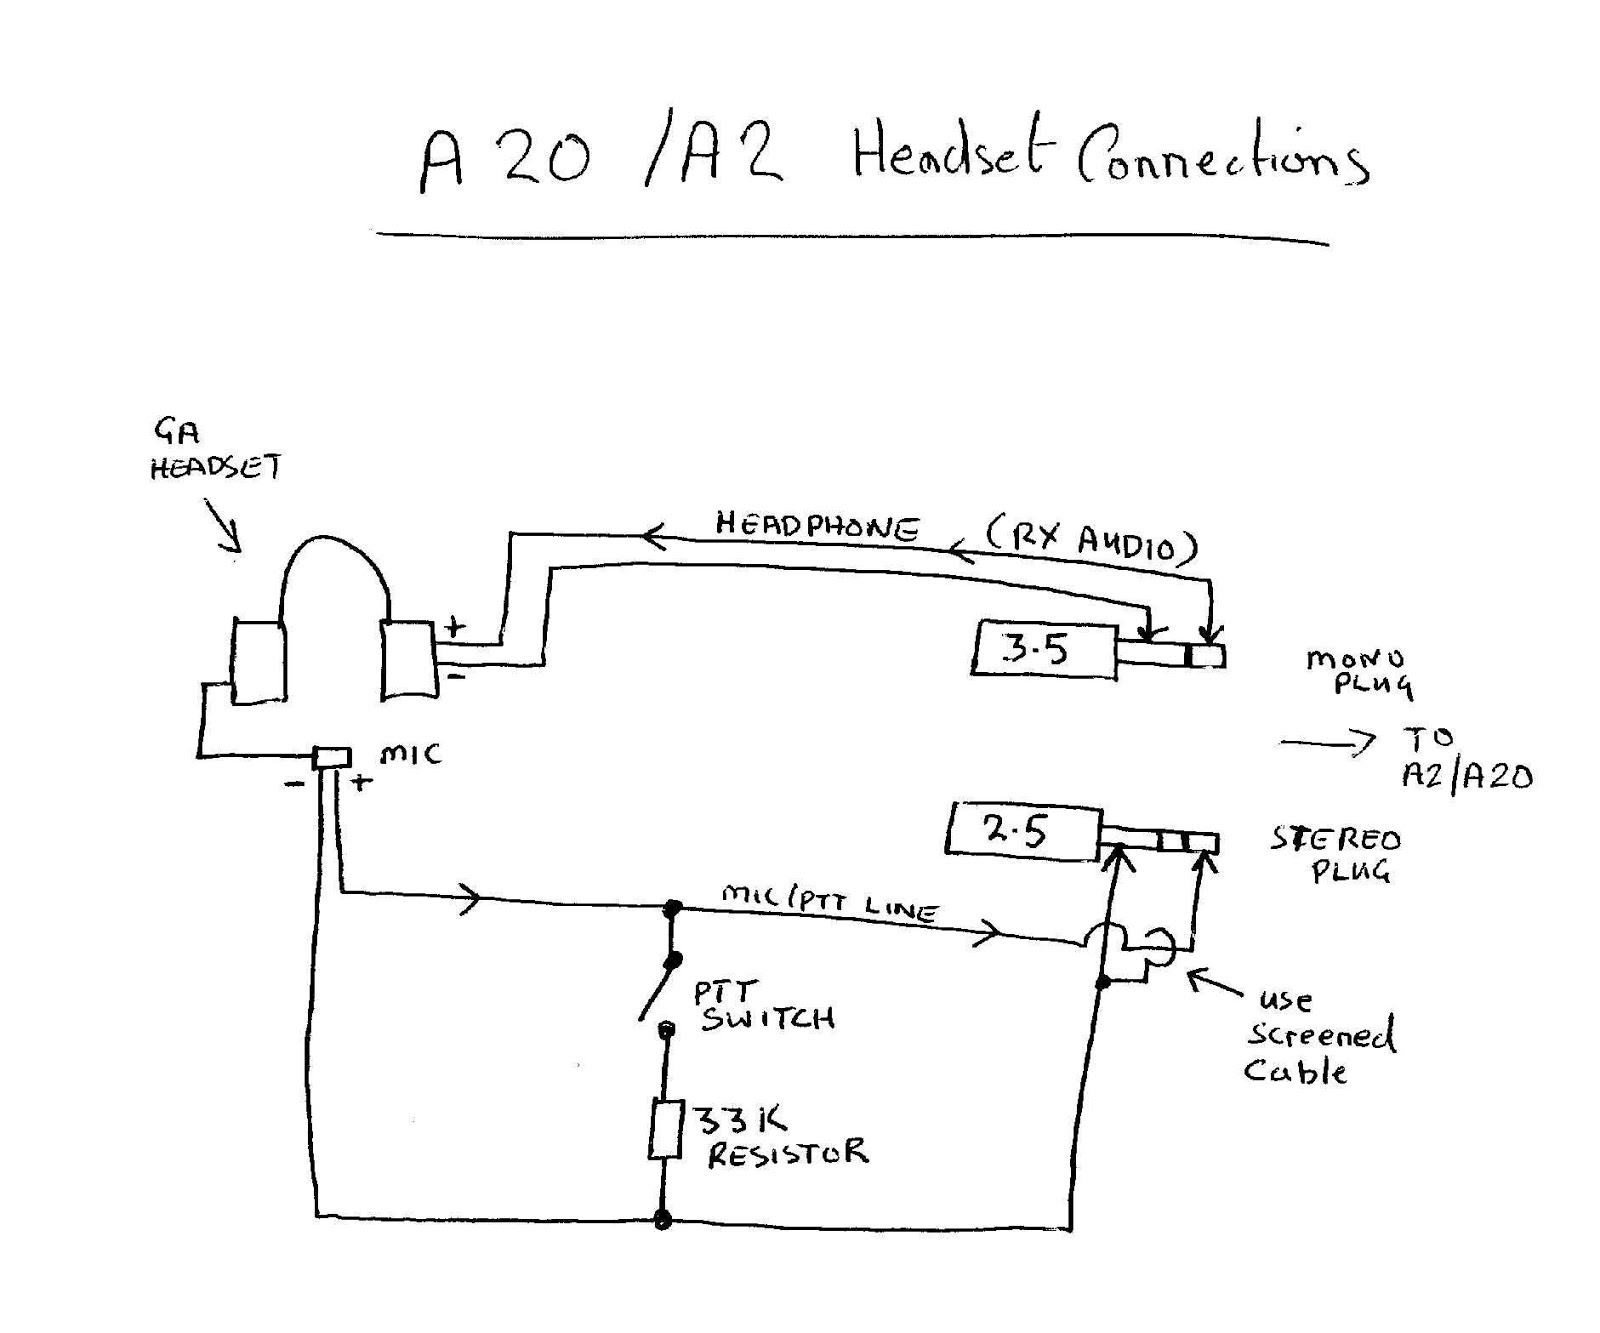 K40 Mic Wiring Diagram Auto Electrical Xlr 3 Pin Midland Astatic Diagrams N20 Contemporary Gl1500 Cb